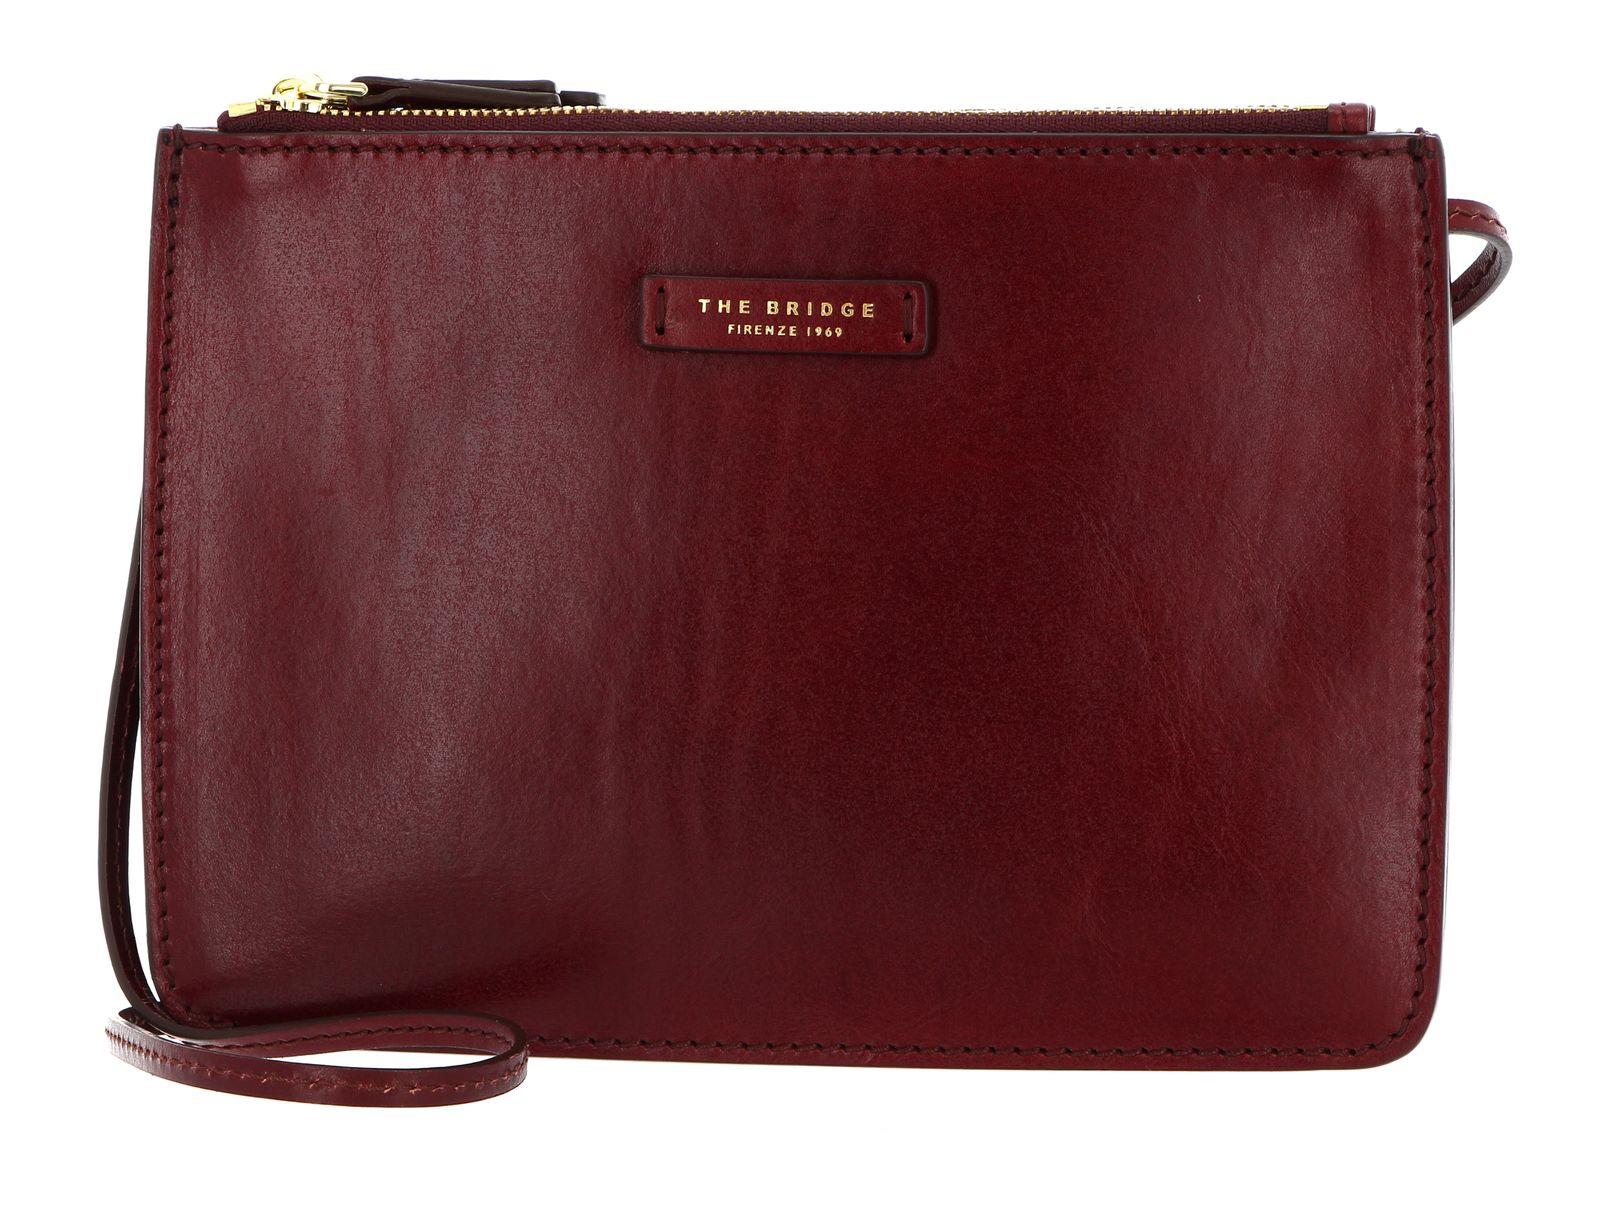 THE BRIDGE Rustici Ladie's Handbag with Zip Chianti Bordeaux / Oro